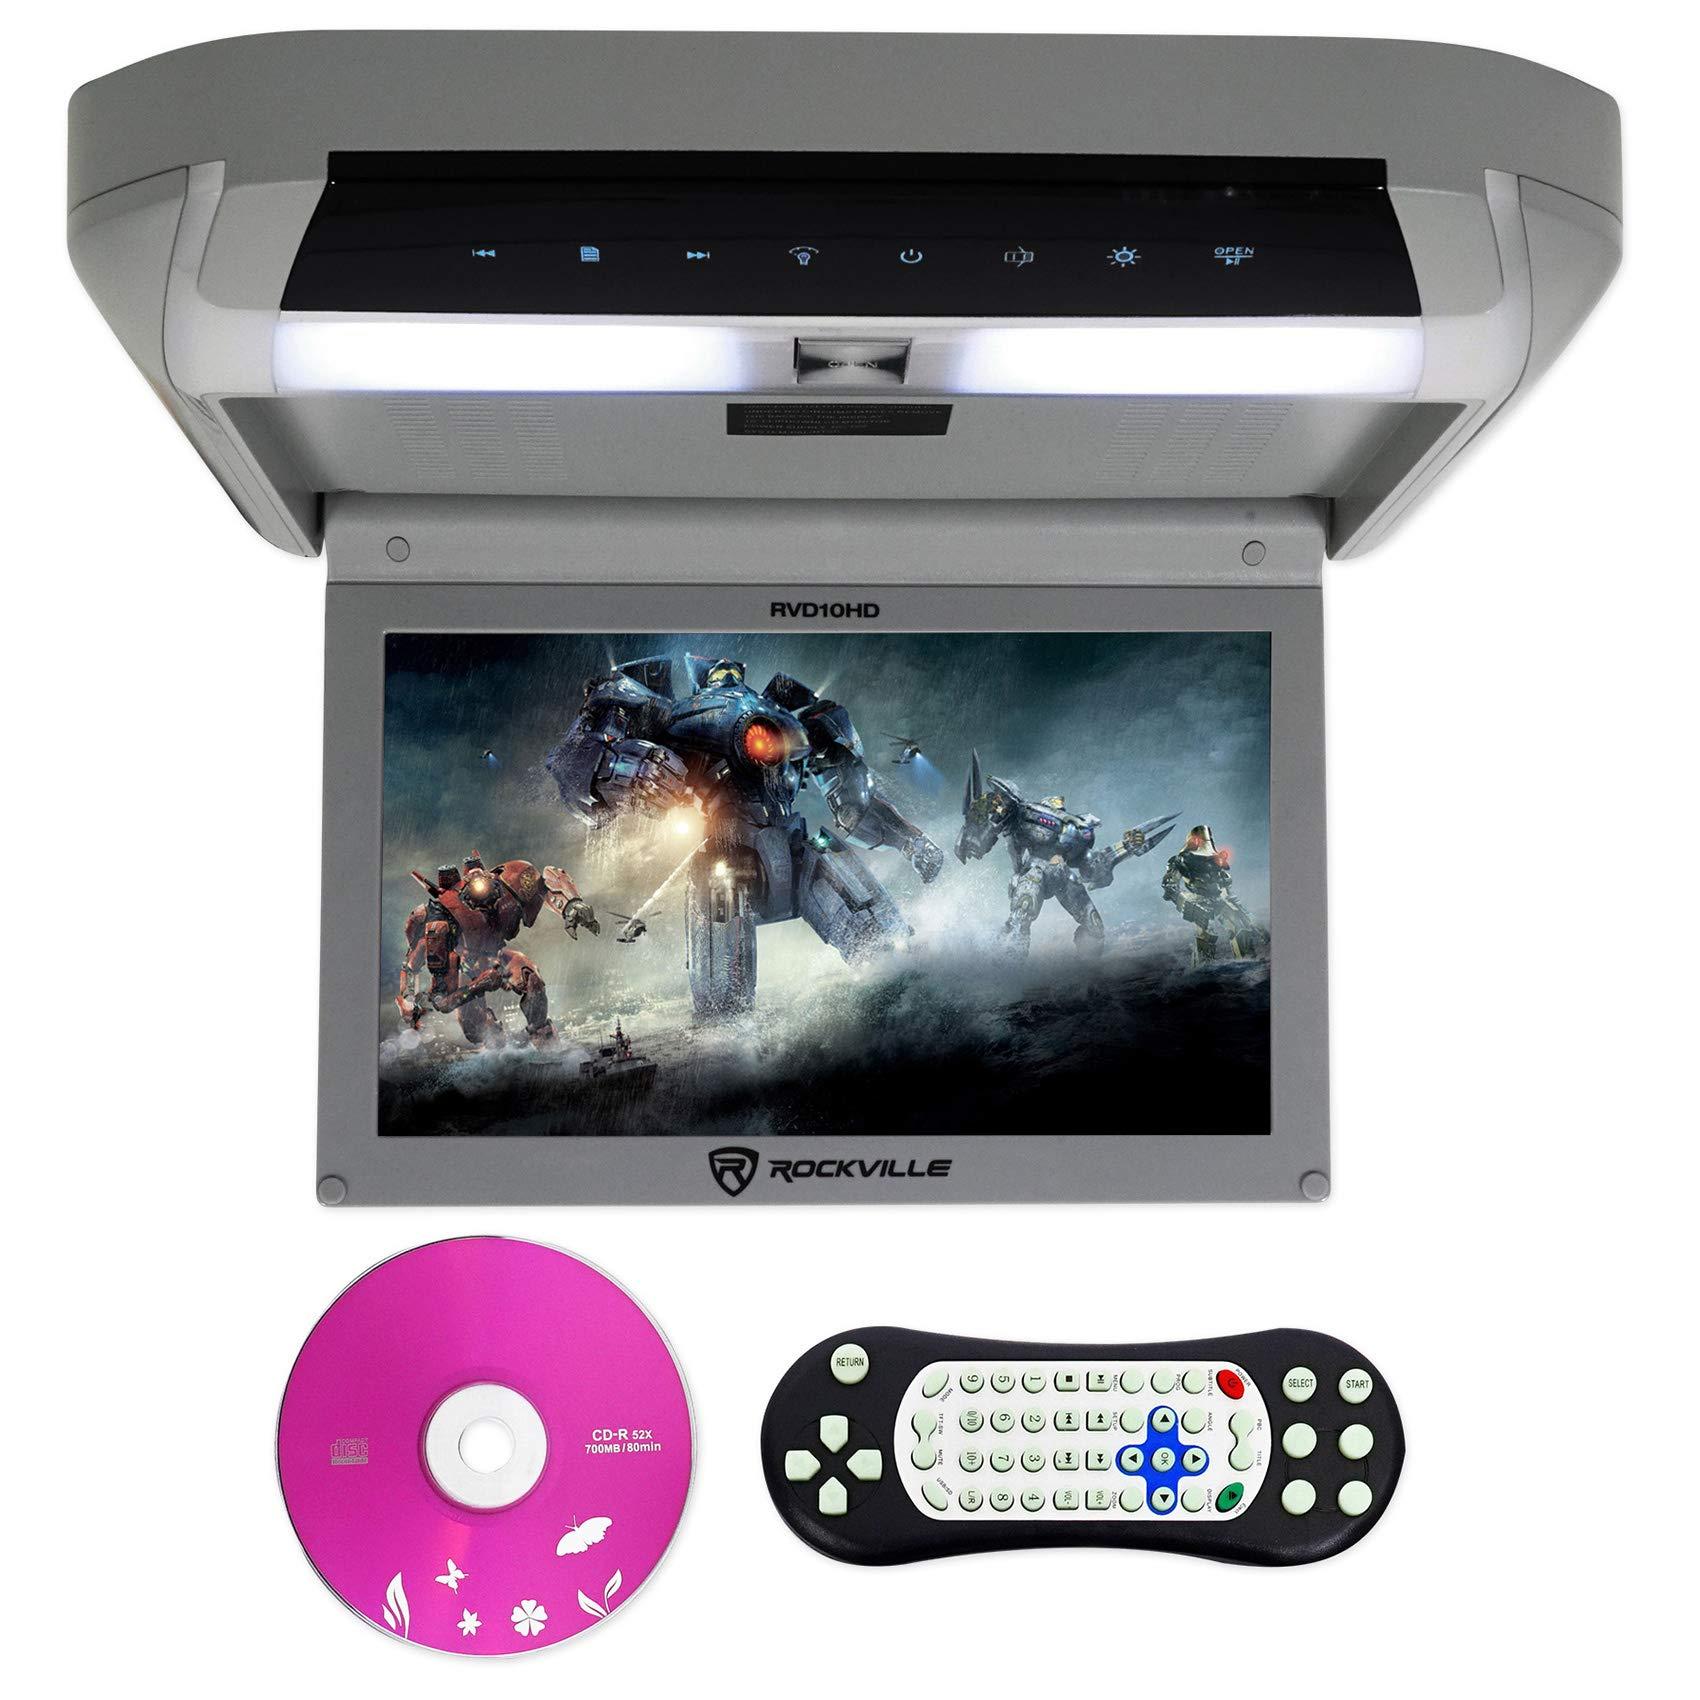 Rockville RVD10HD-GR Flip Down Monitor DVD Player, HDMI, USB, Games, LED, 10.1 by Rockville